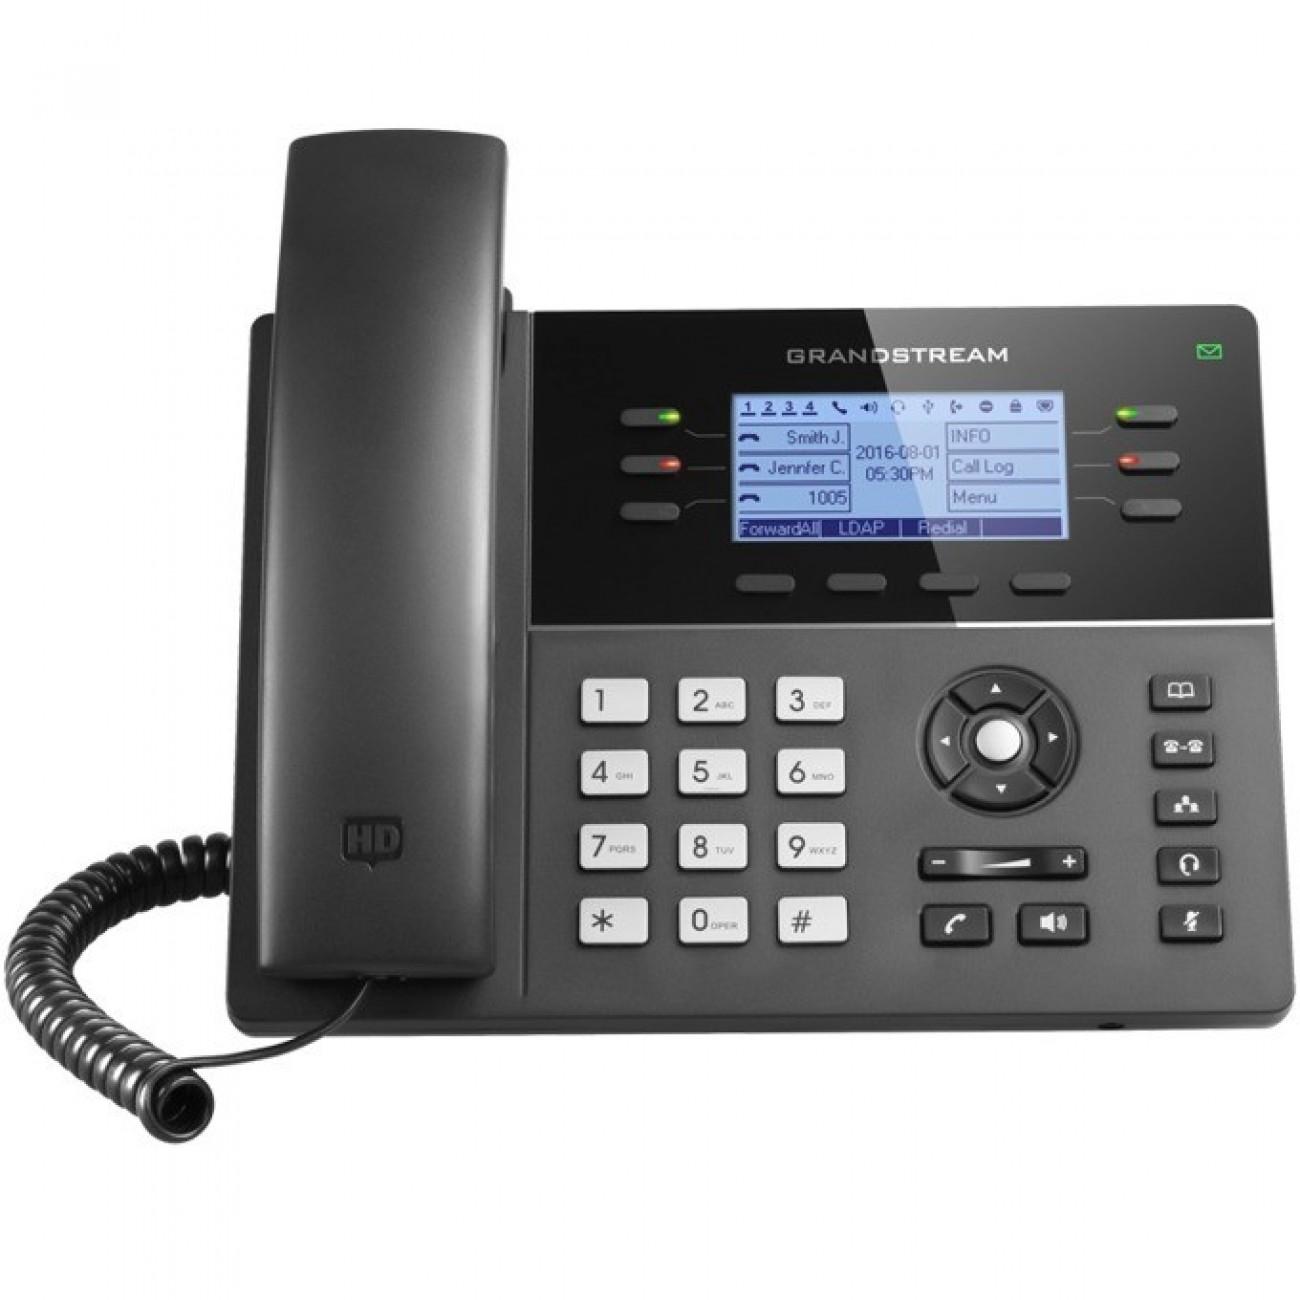 VoIP телефон GRANDSTREAM GXP1760W, LCD дисплей 200 x 80 pixel (3.3), 6 линии, черен в VoIP Телефони -  | Alleop